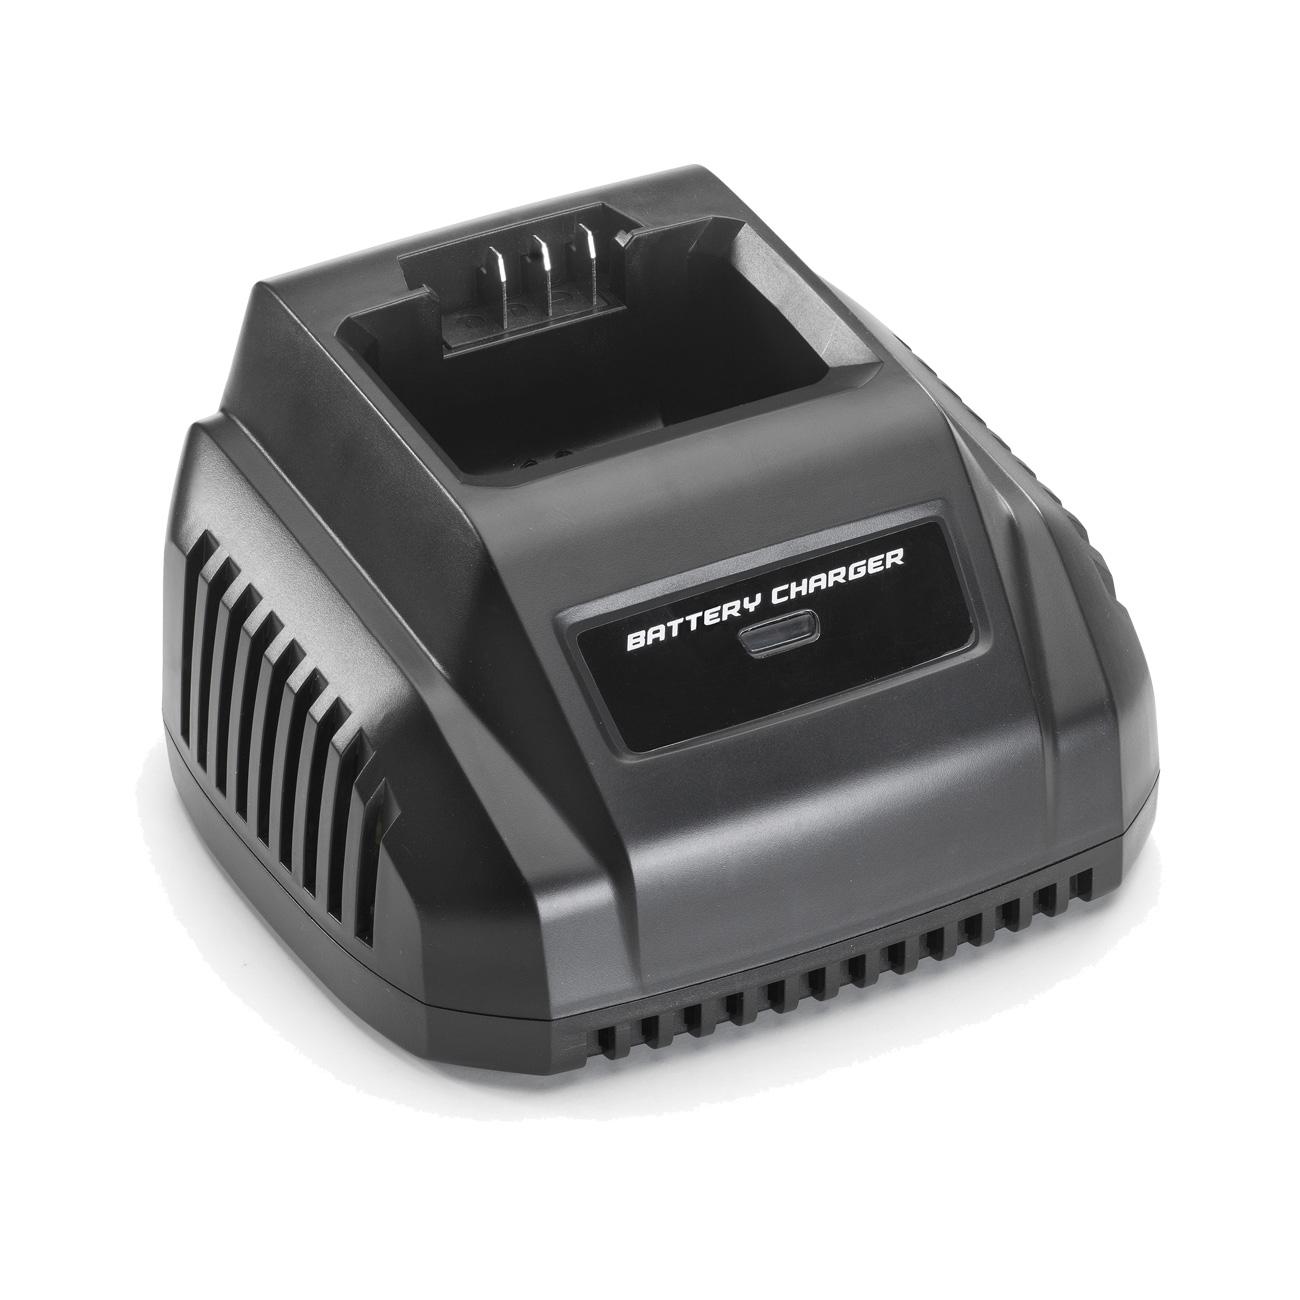 Image of Caricabatterie Alpina 40V